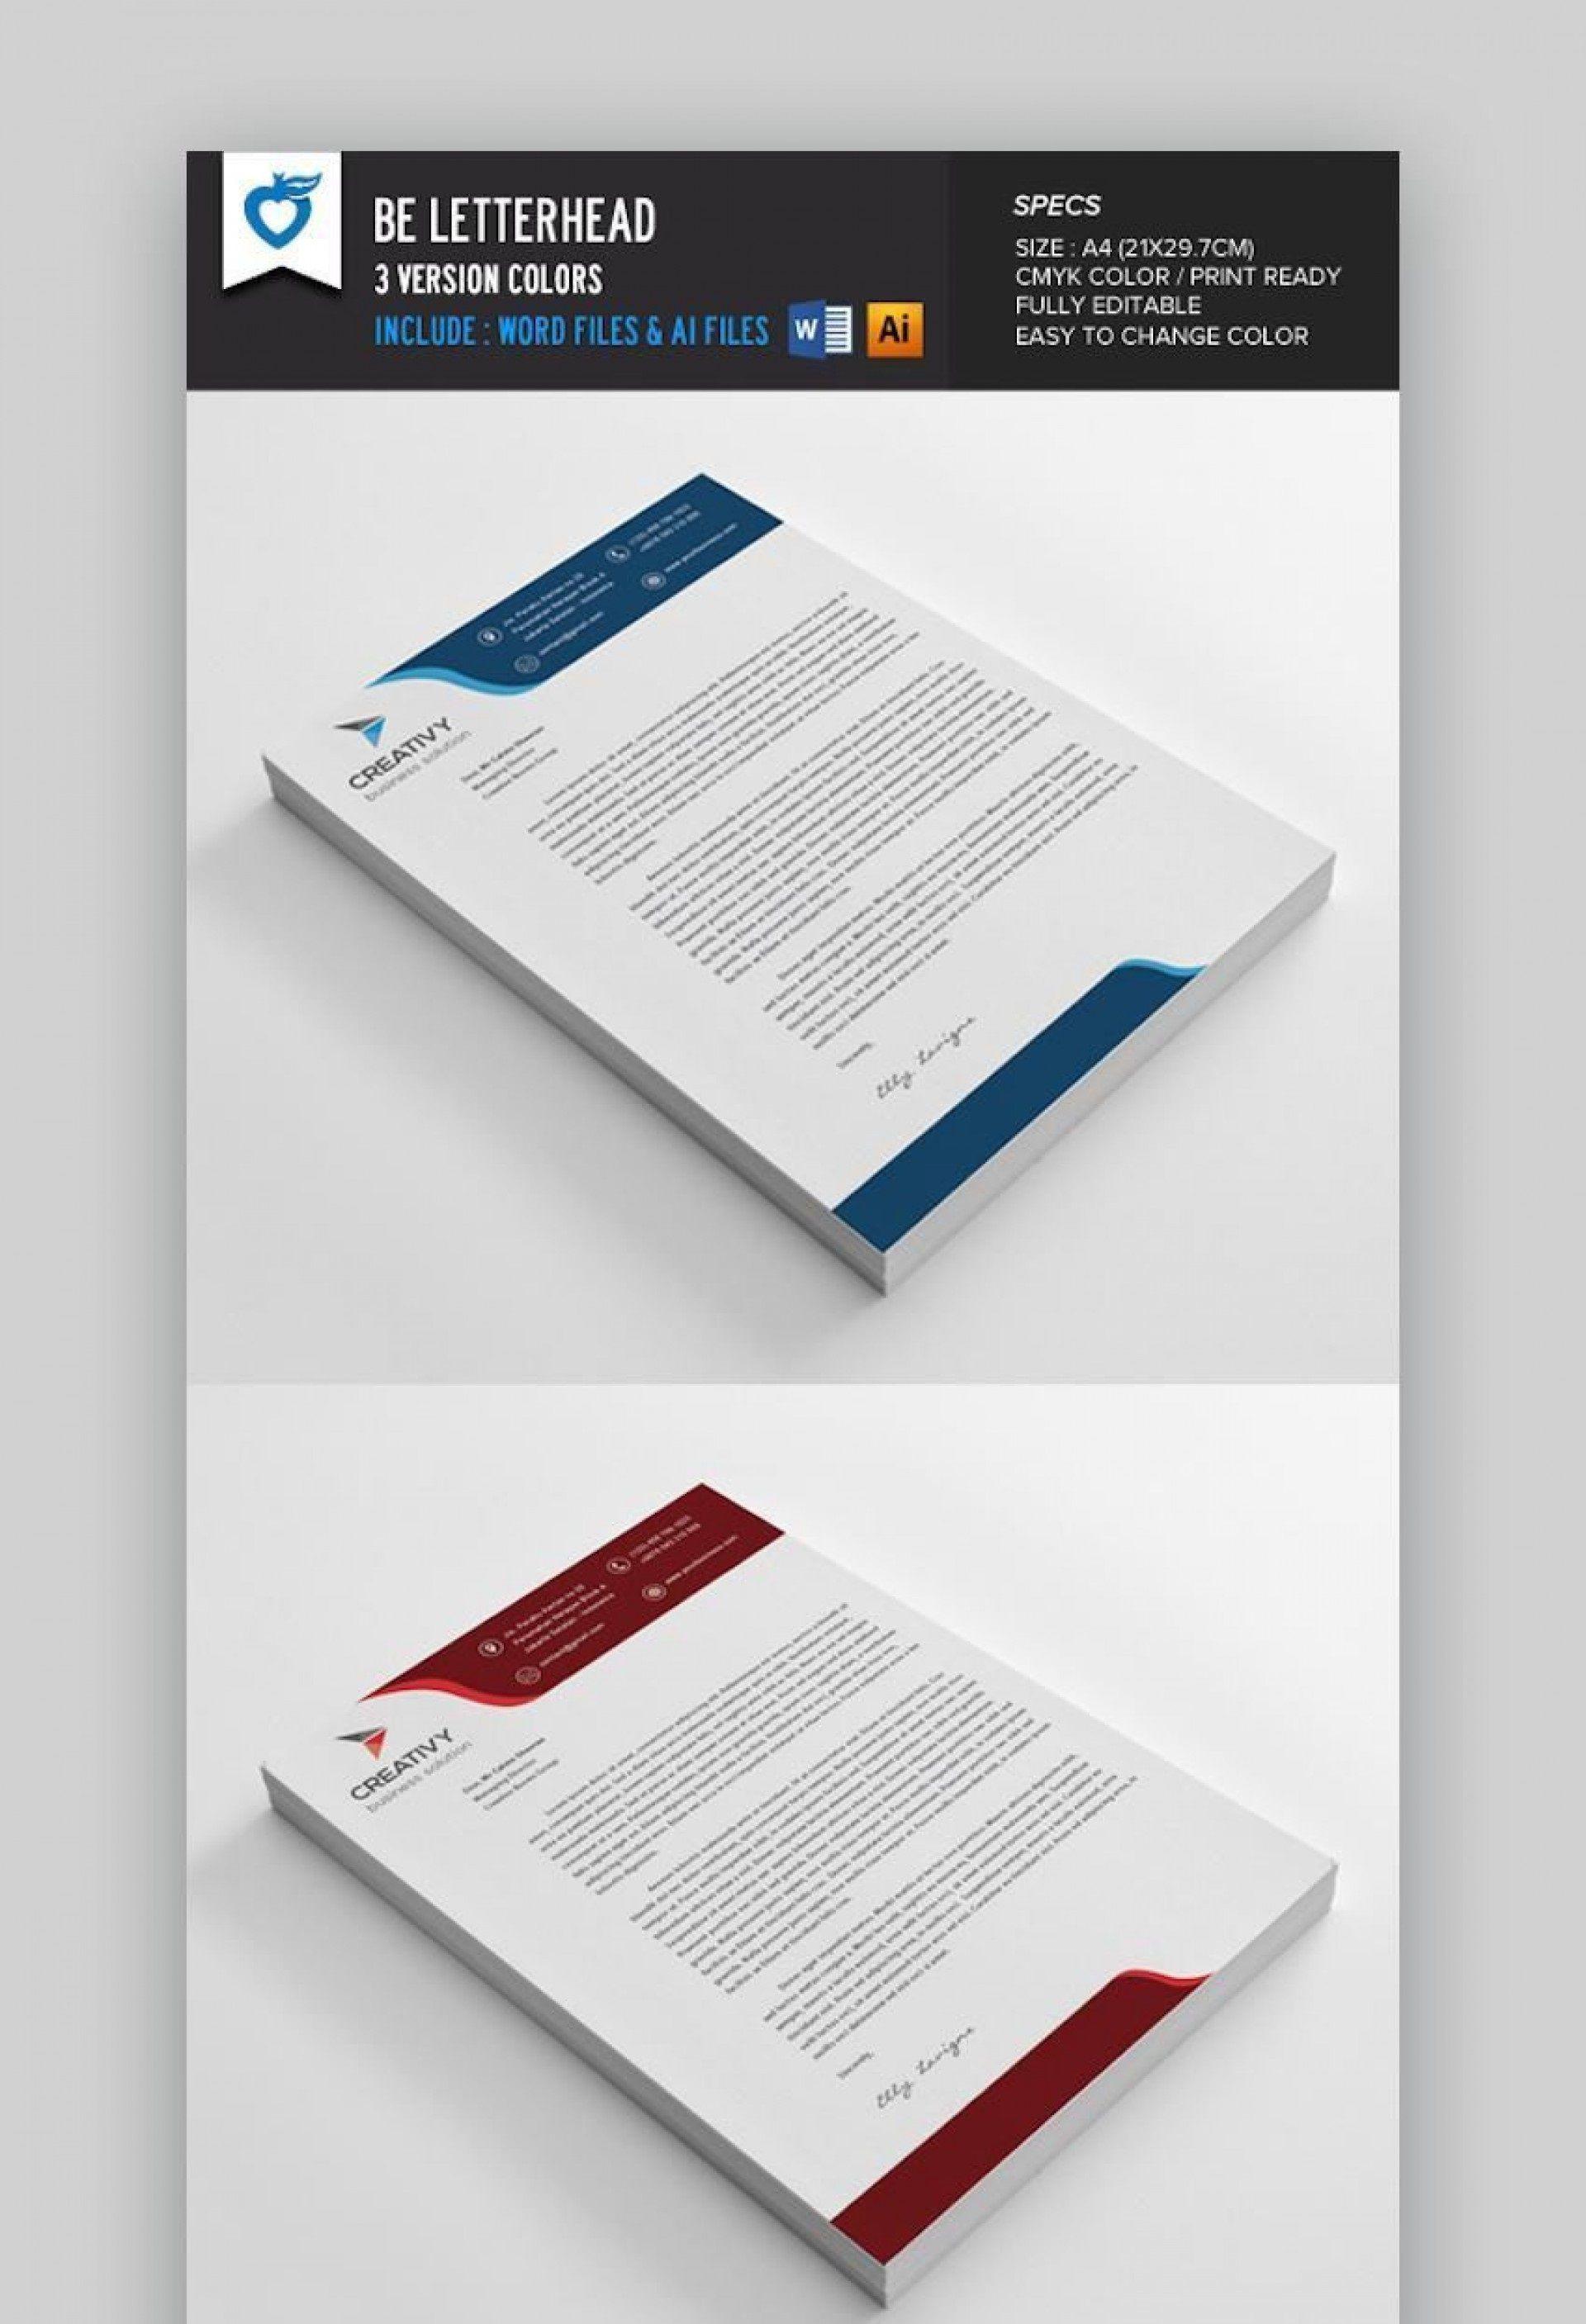 008 Excellent Letterhead Template Free Download Ai Picture  File